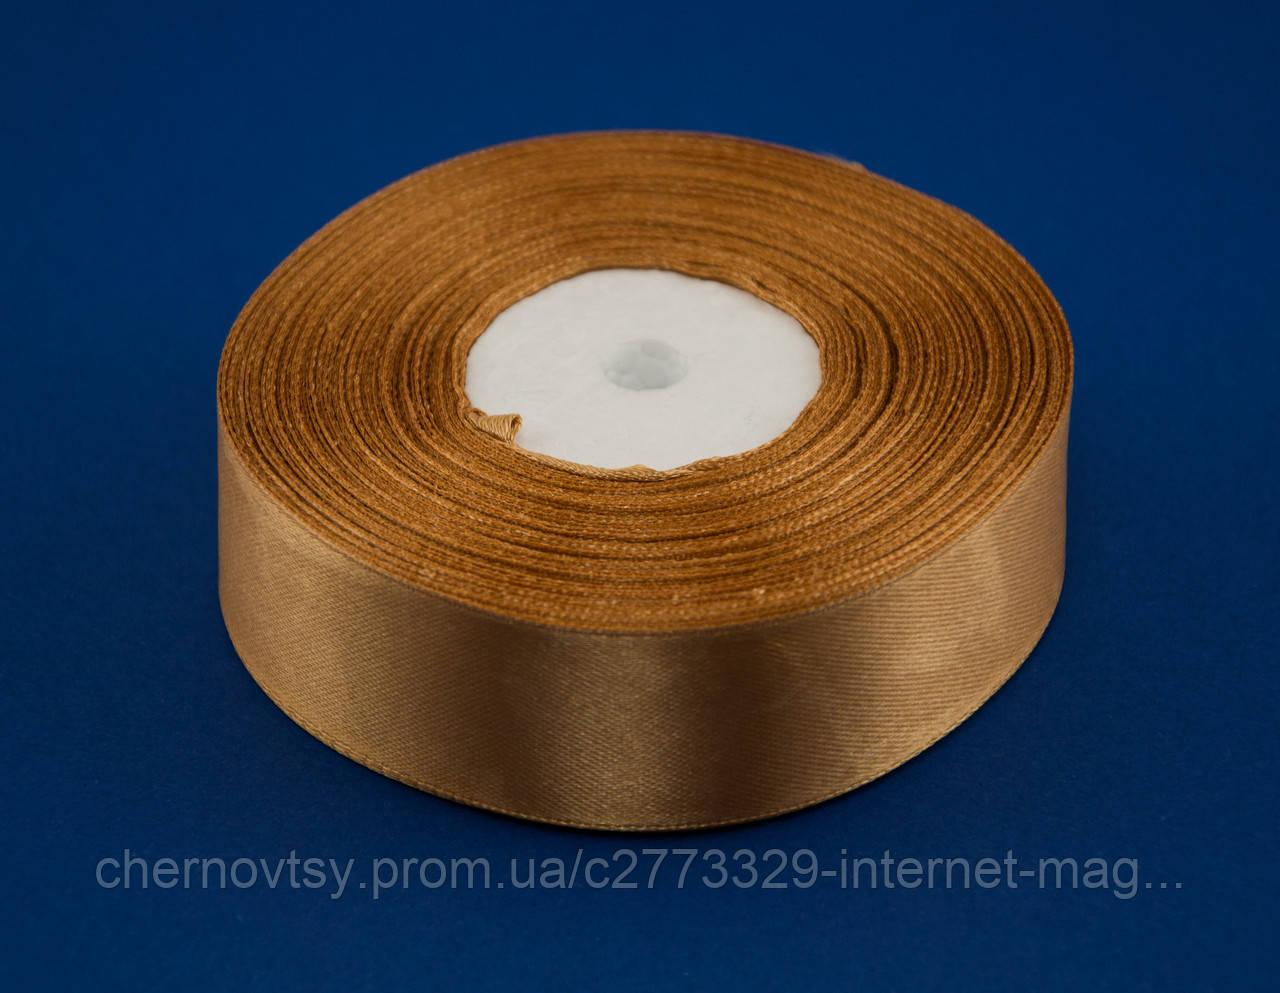 Стрічка атлас 1.2 см, 33 м, № 157 Золотиста